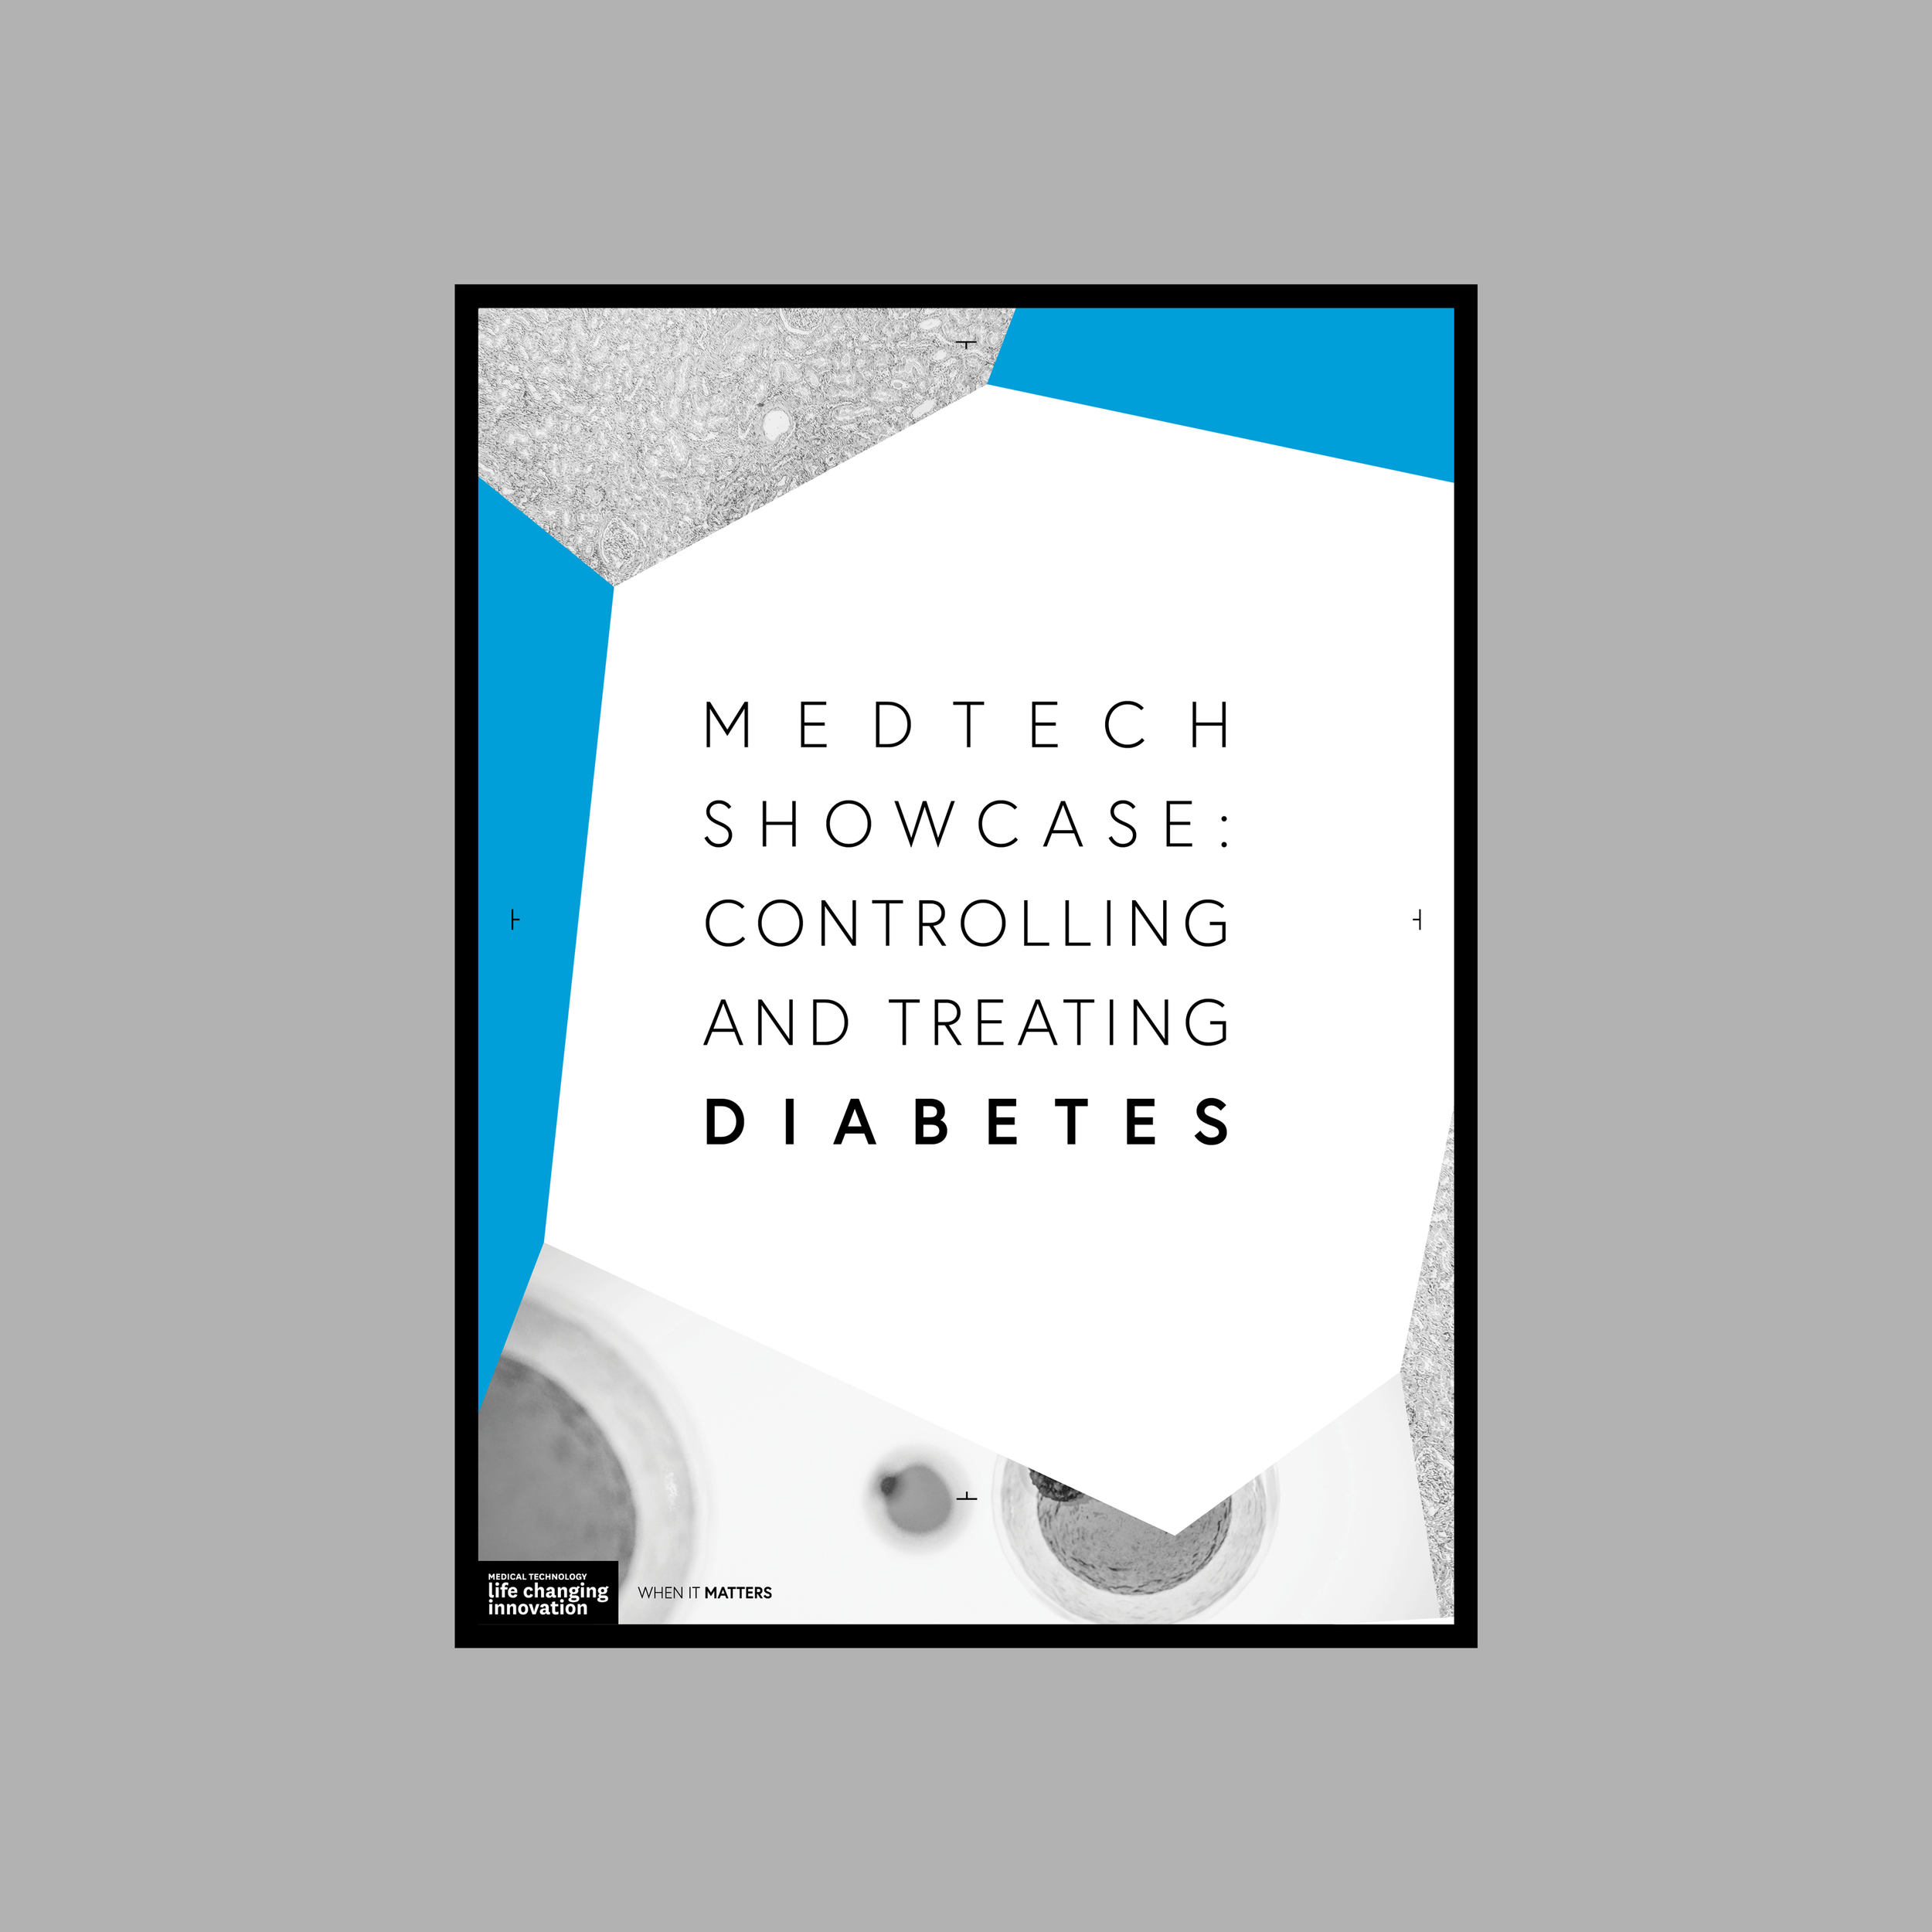 MedTech-Showcase-Poster-B.png